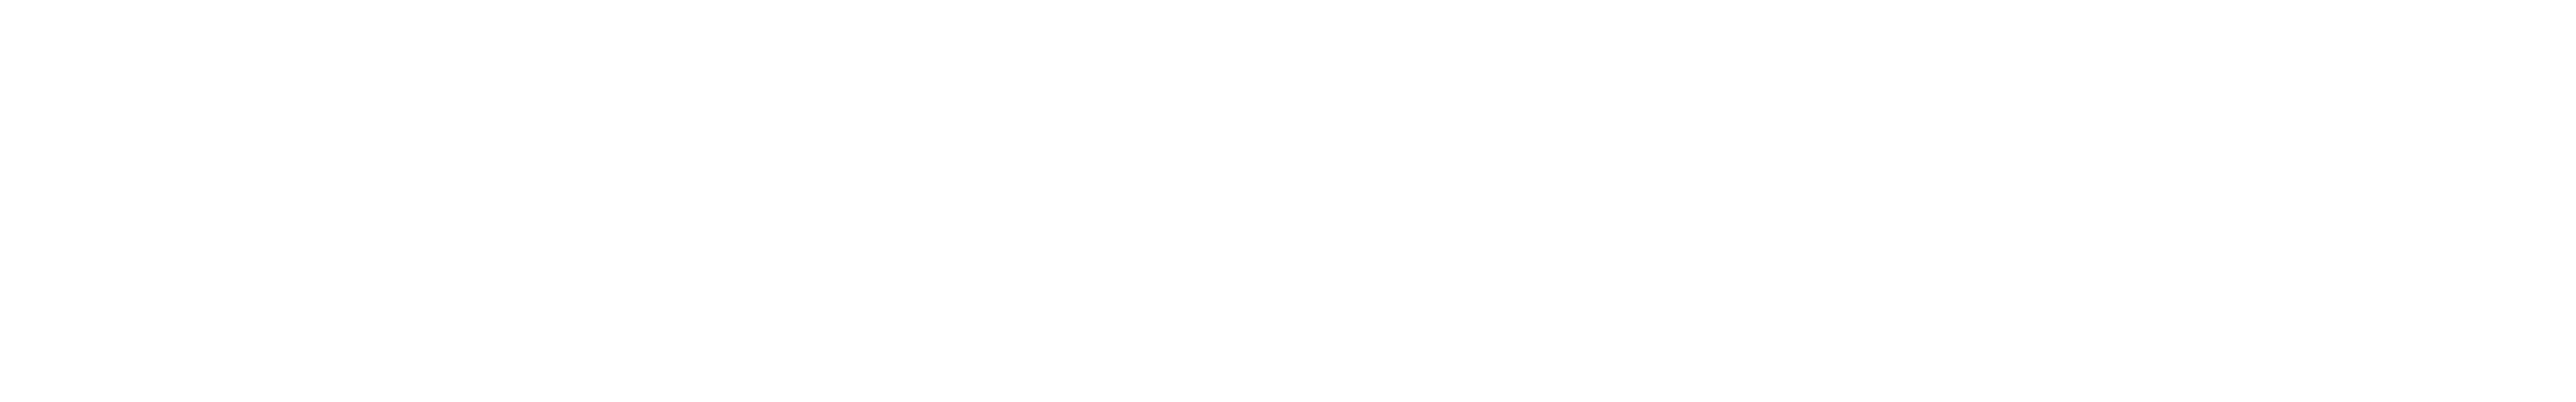 distrokid_logo_for_dark_bg